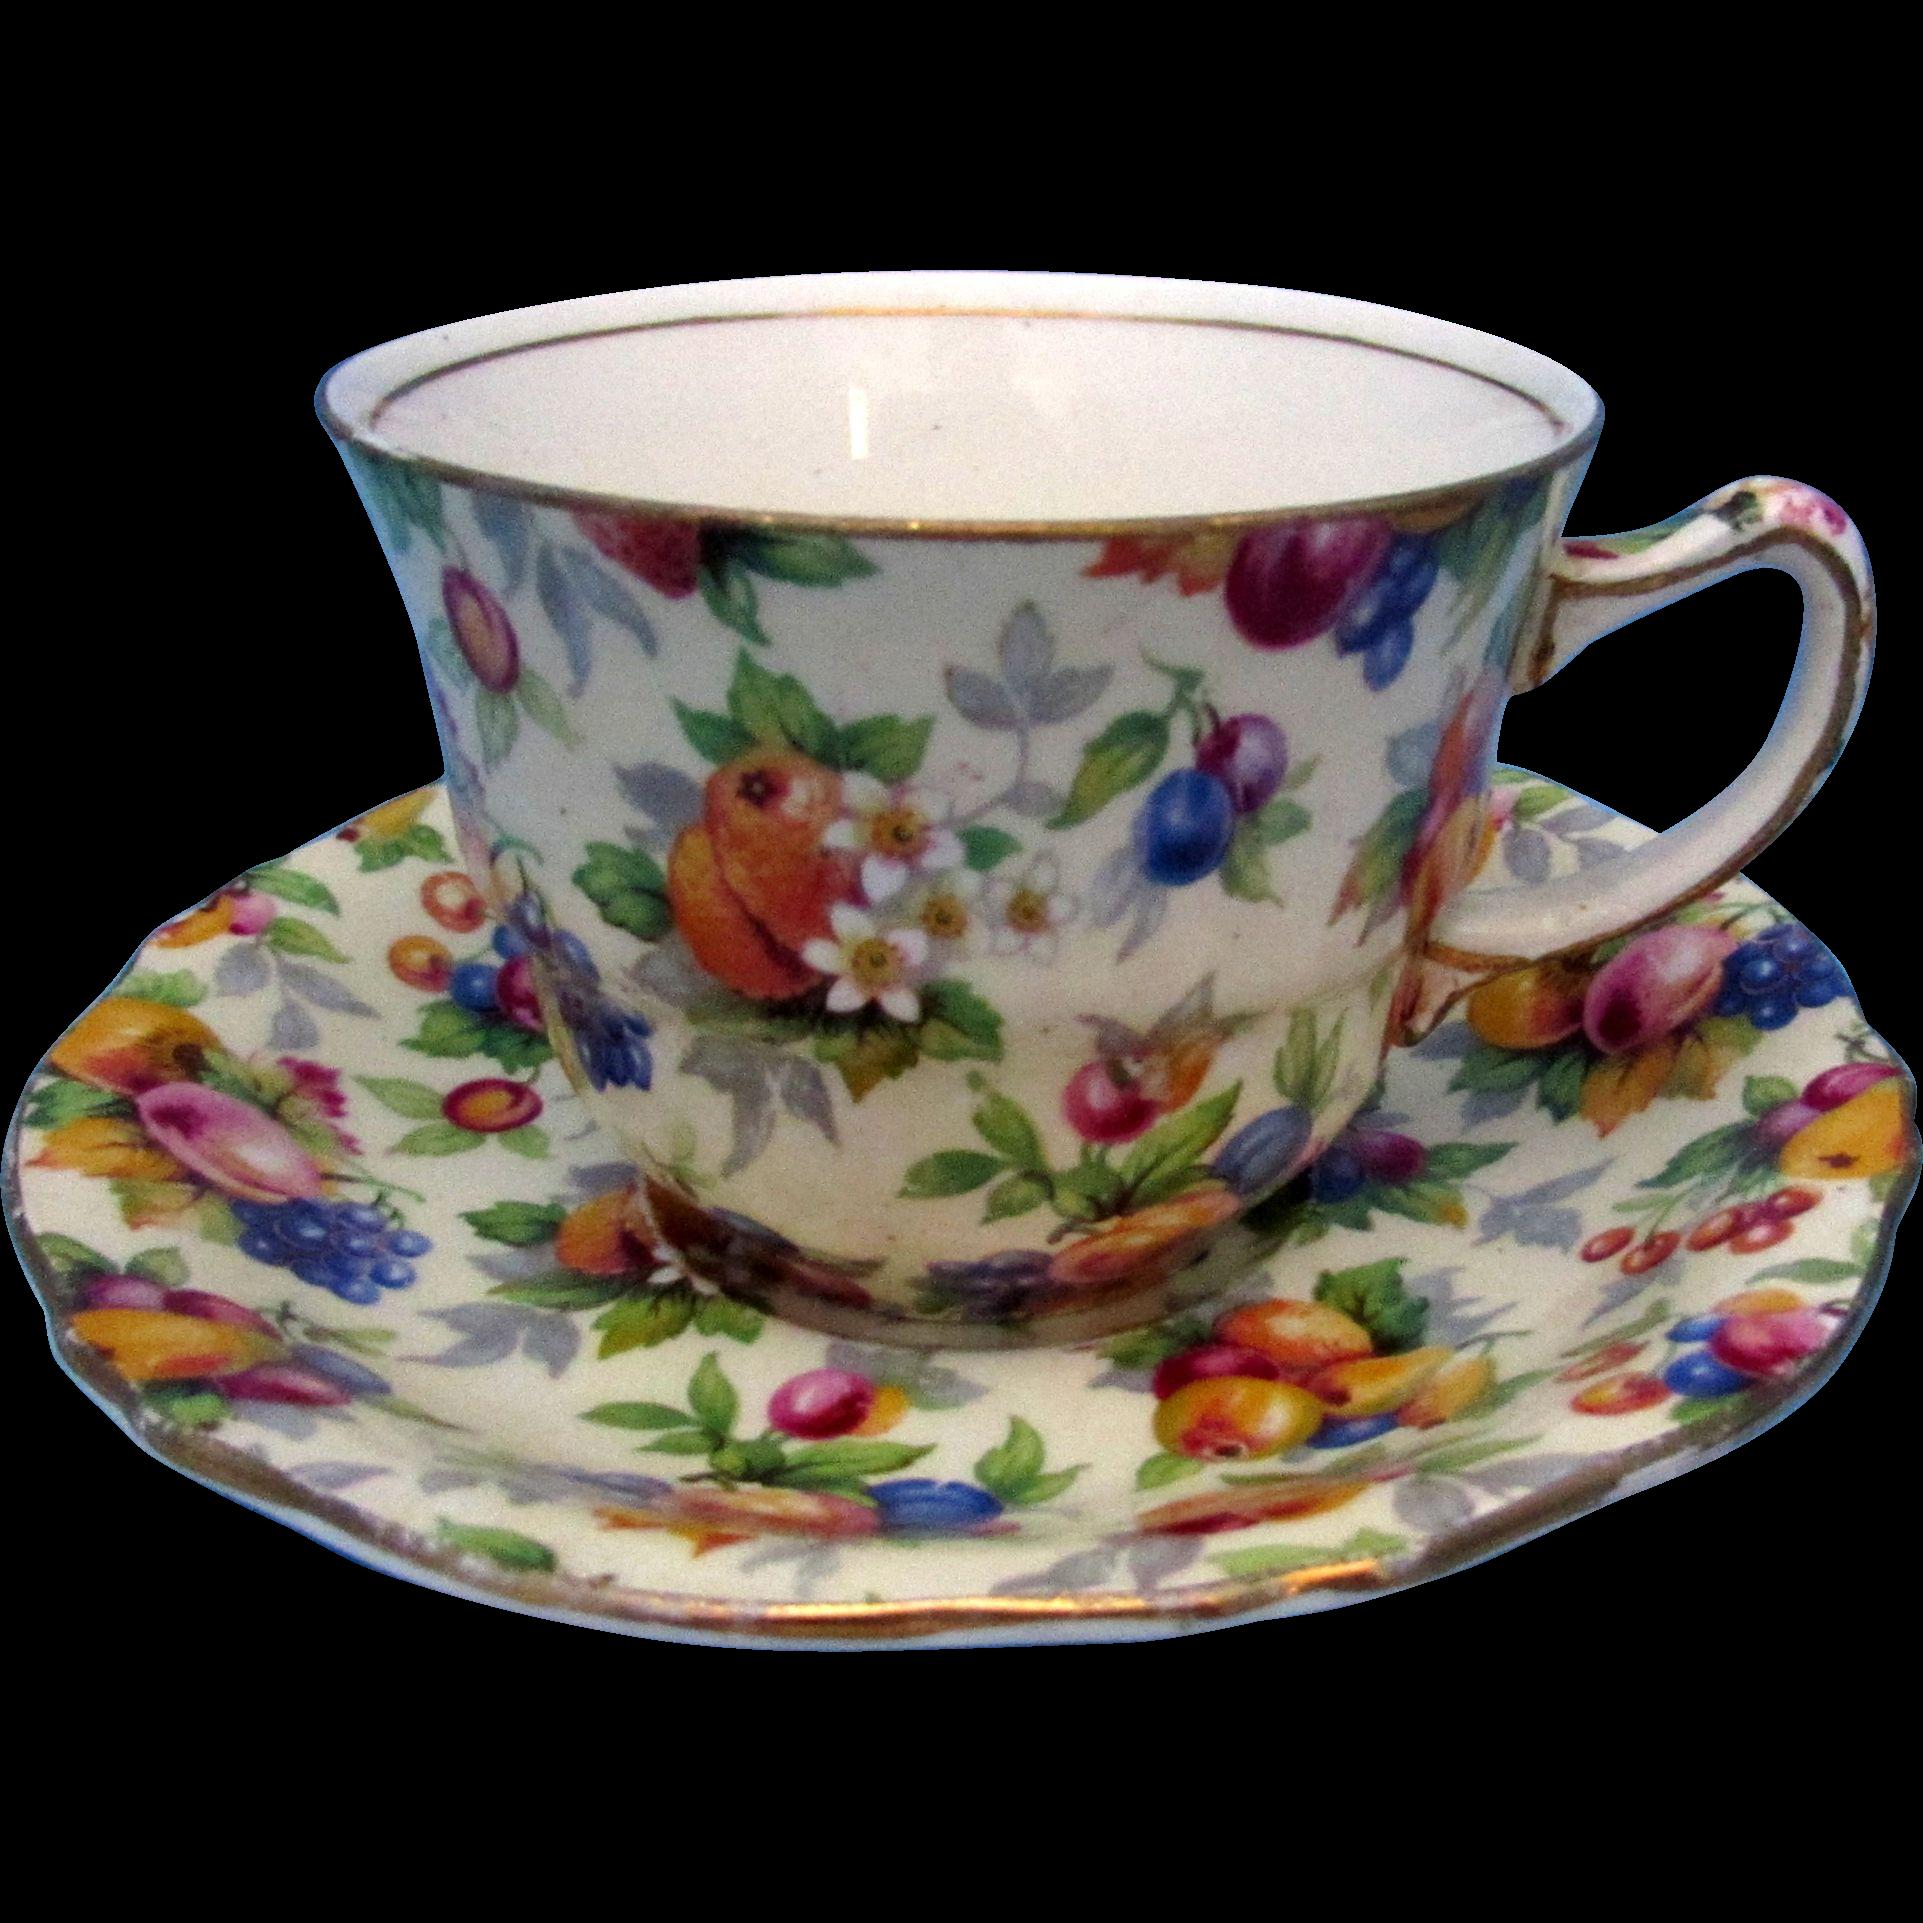 Royal Winton Evesham Chintz Cups And Saucers Vintage Bone China  ~ Tazas Para Infusiones El Corte Ingles